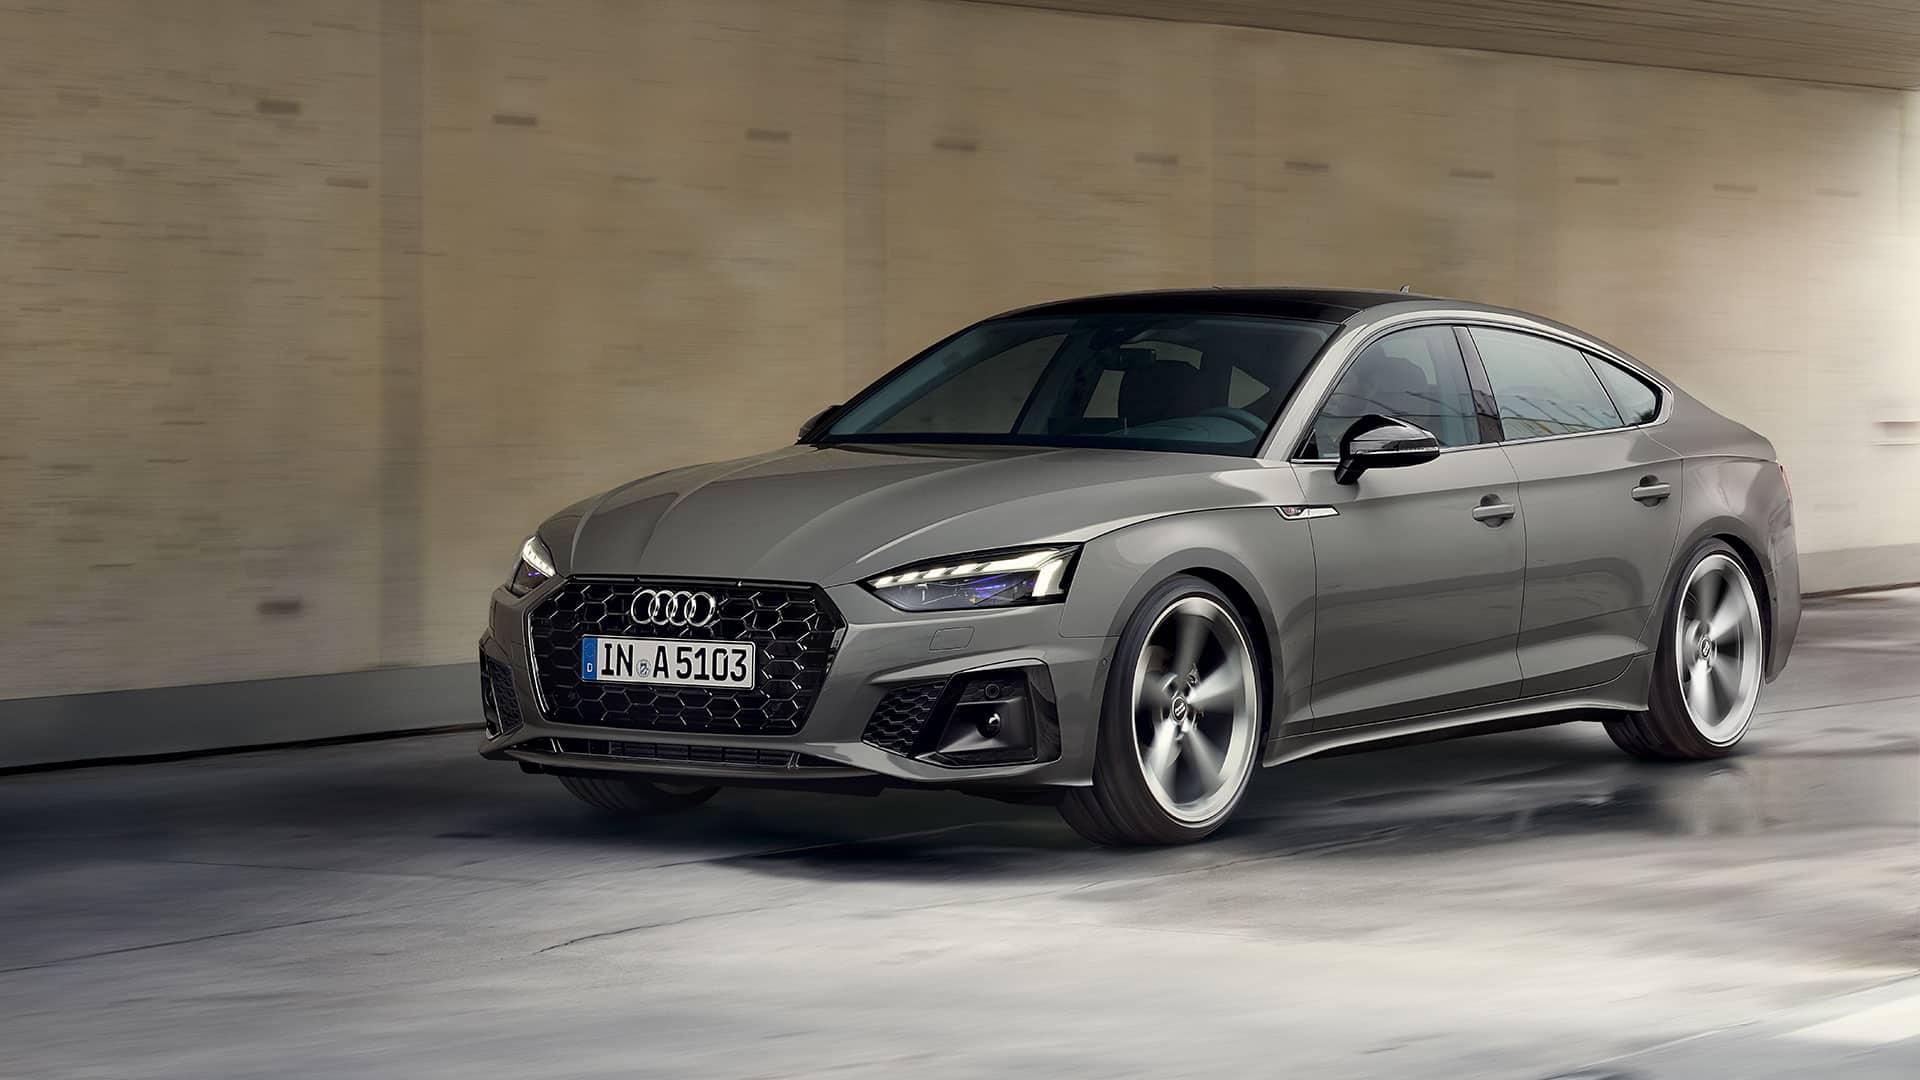 Audi A5 Sportback. Deportivo y versátil.